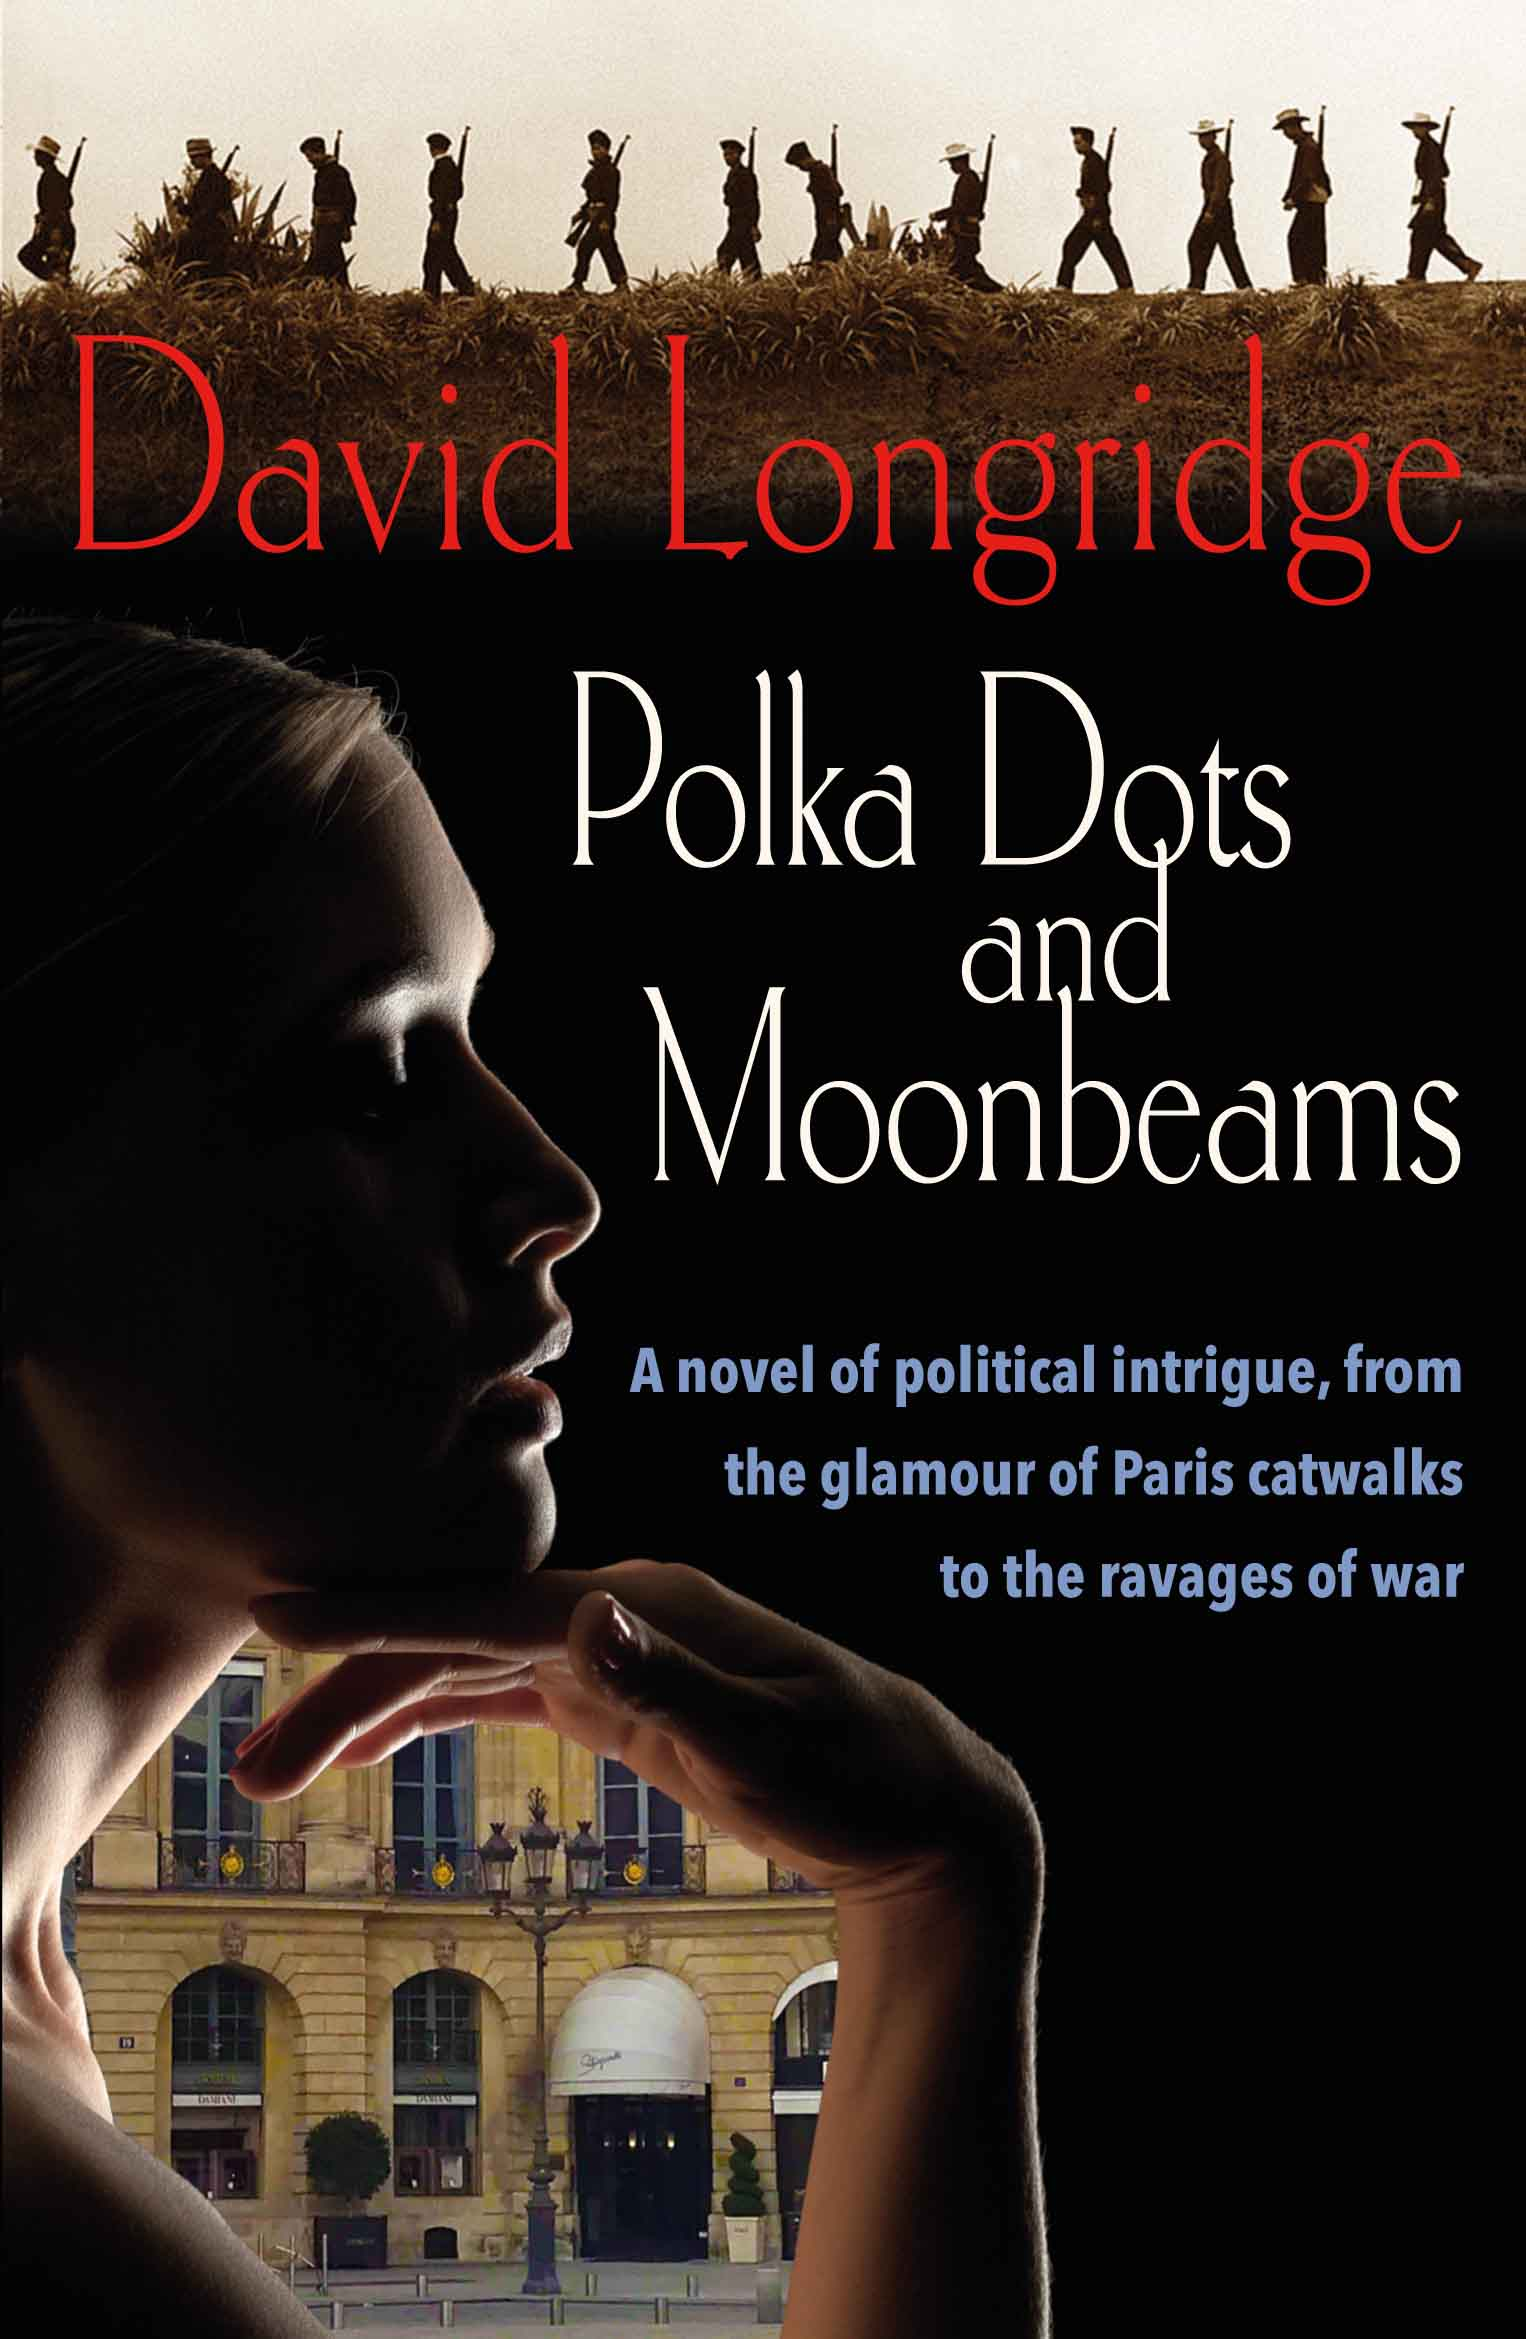 Polka Dota and Moonbeams by David Longridge